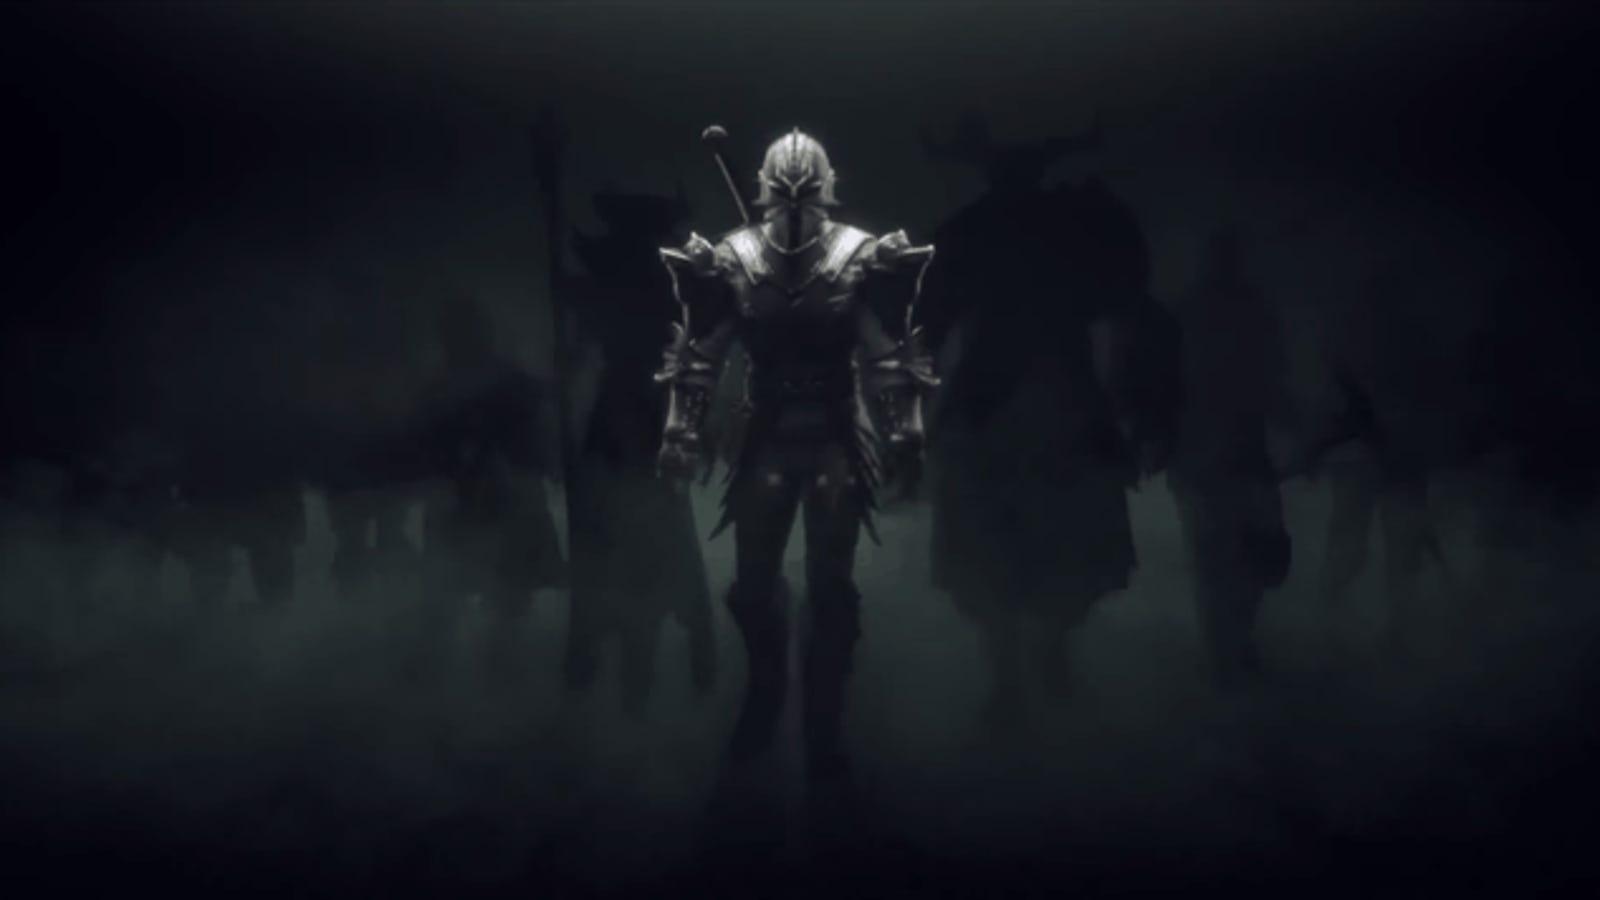 Dragon Age: Inquisition's Ending, Explained